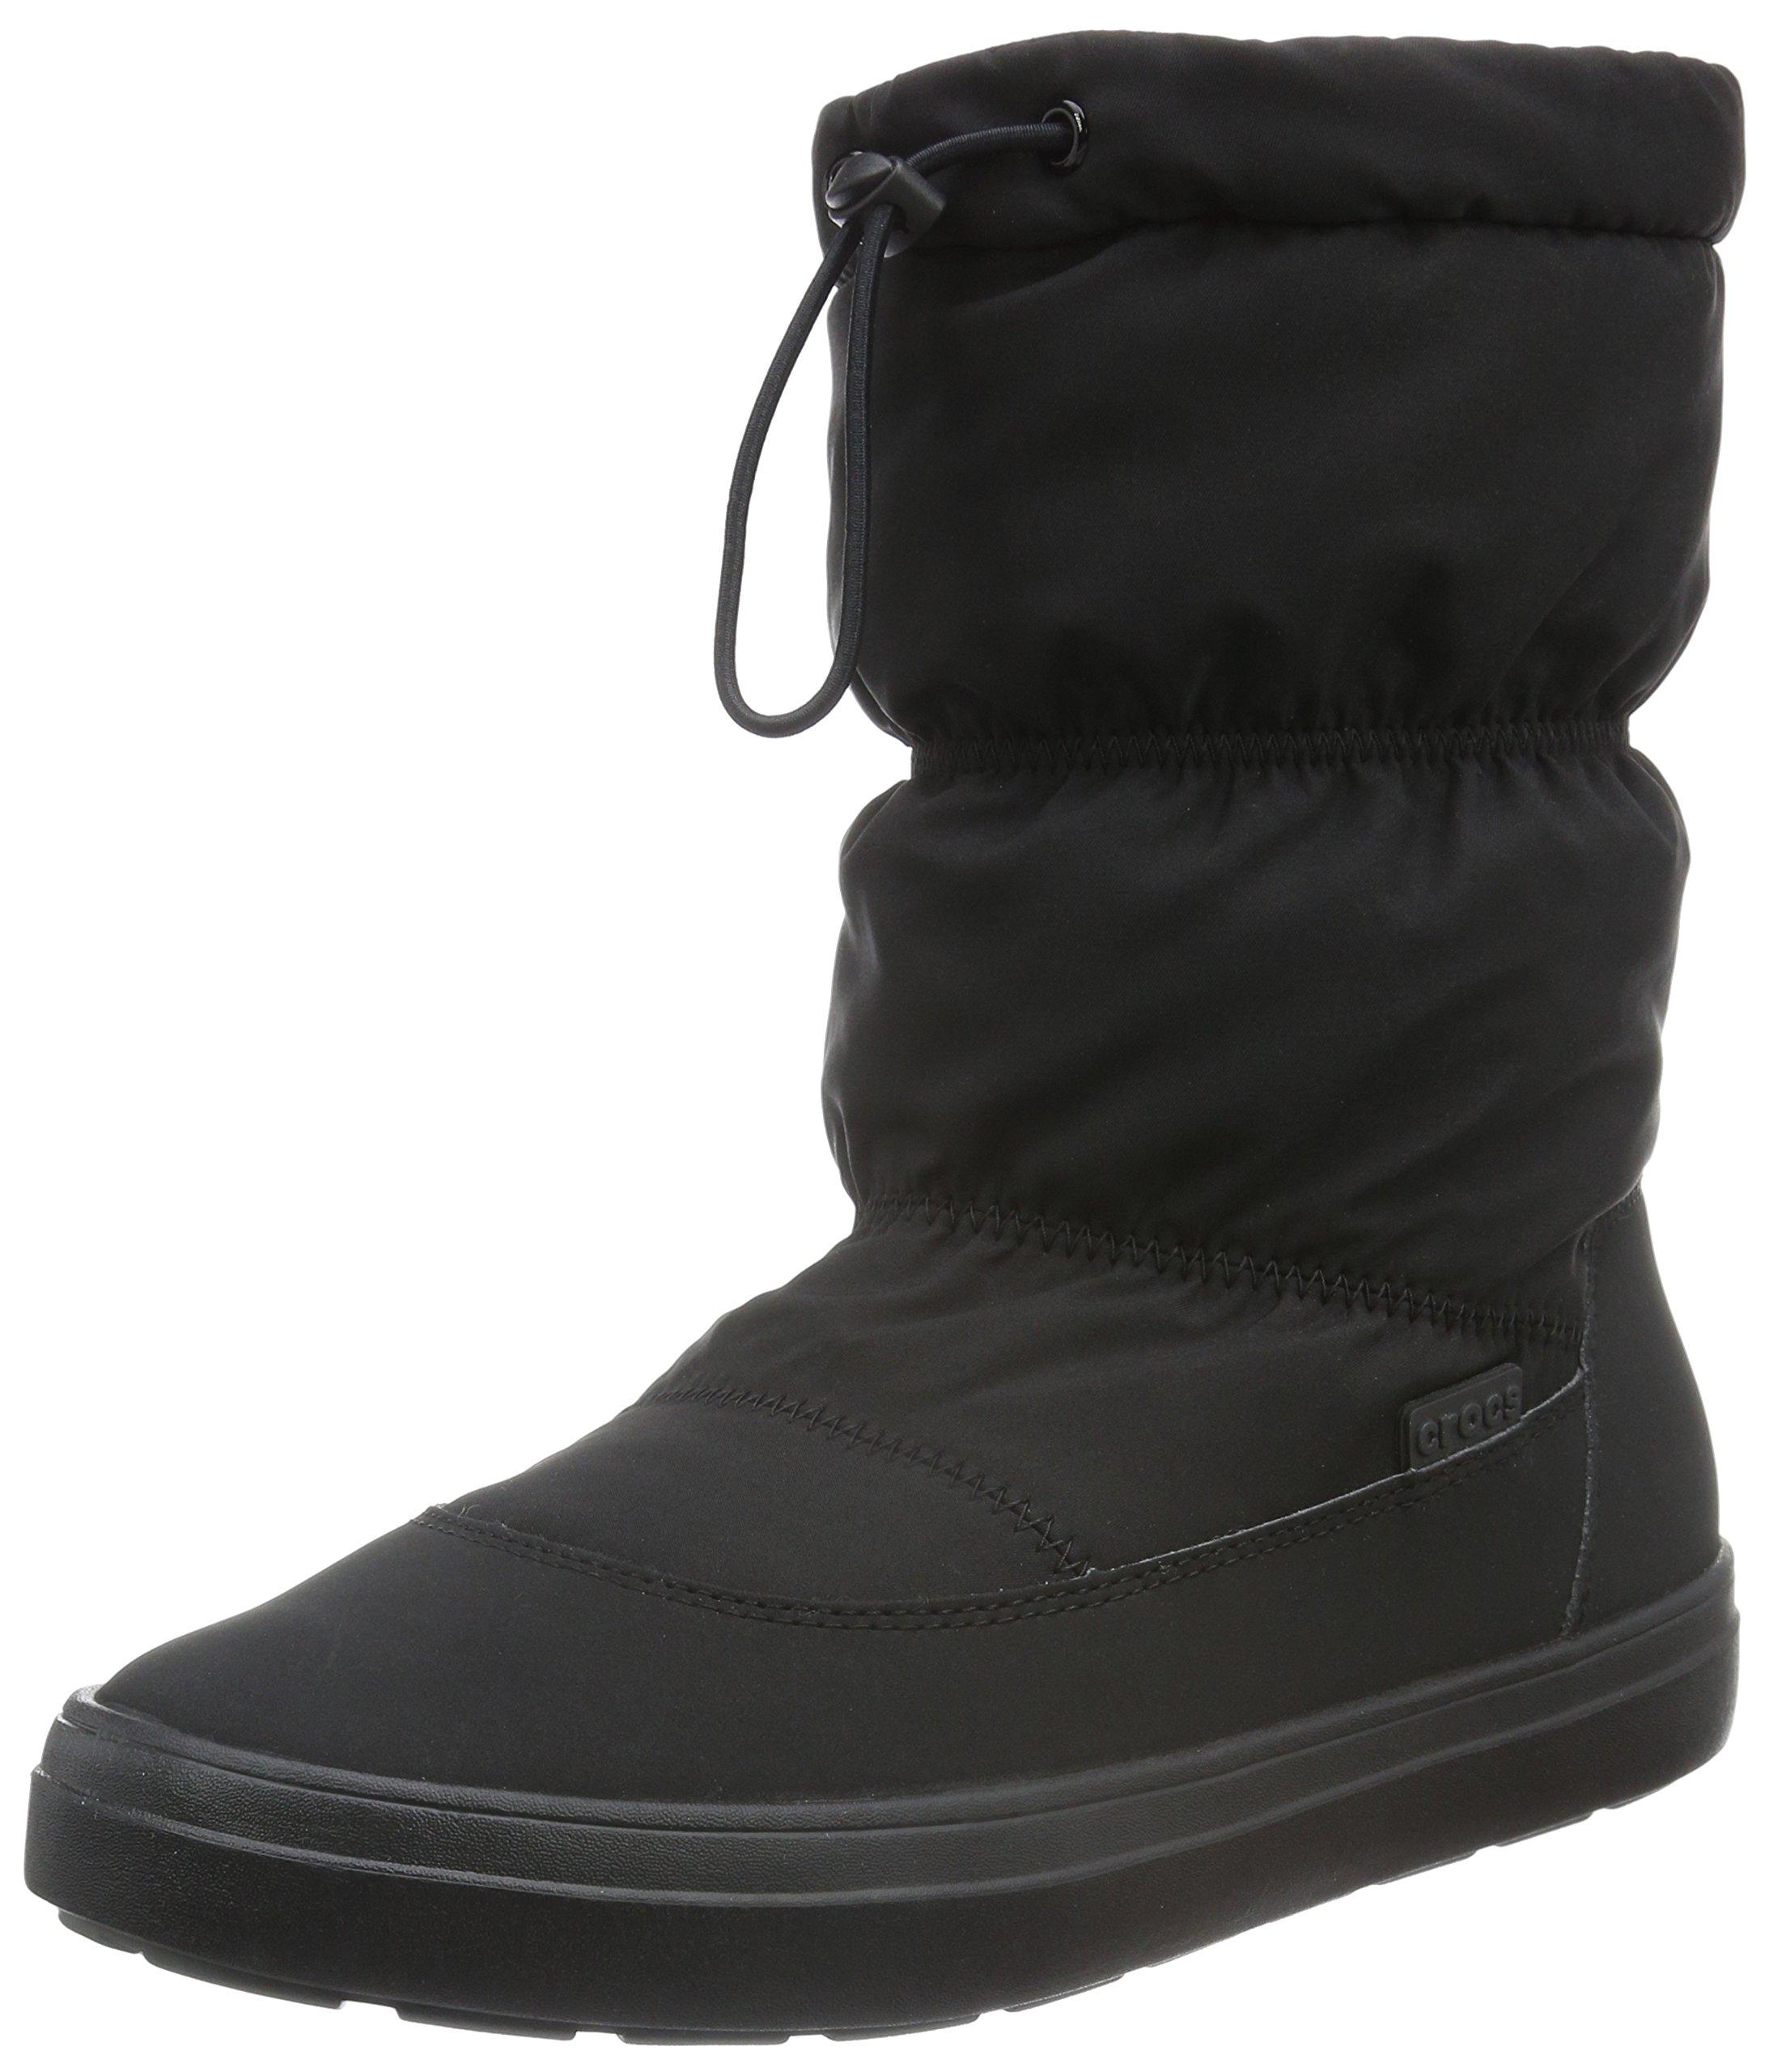 Eu WomenBottes Lodgepoint on 43 Pull Boot FemmeNoirblack42 Crocs eD2HIYb9WE